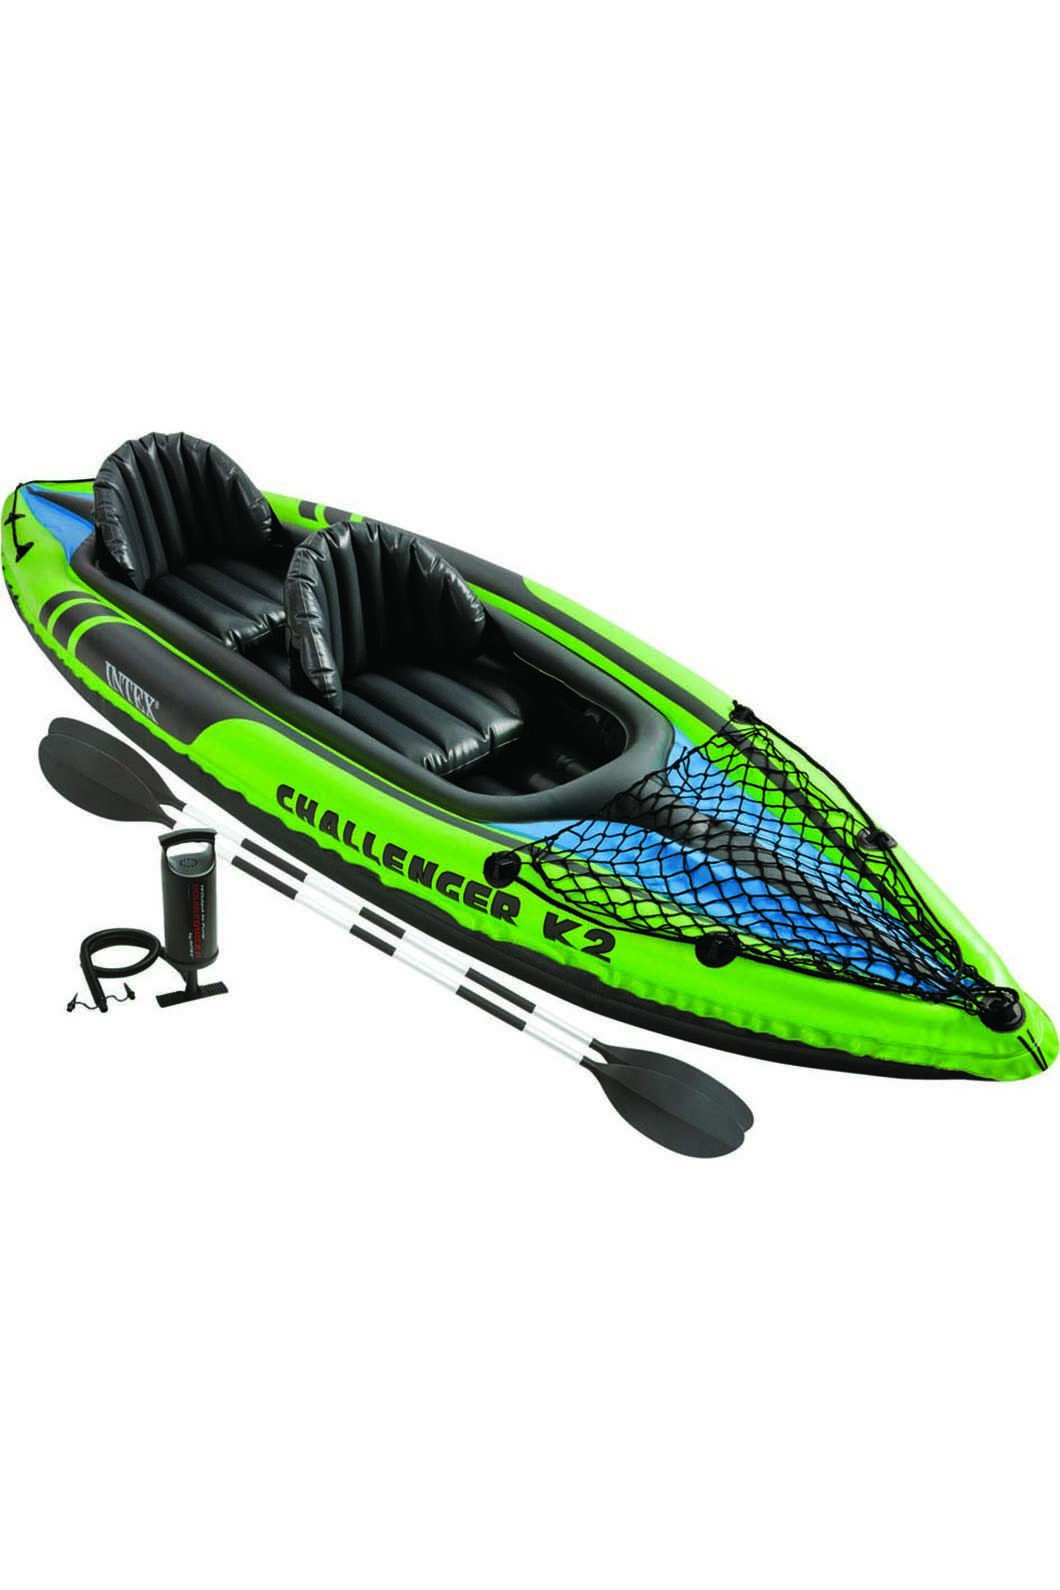 Intex Challenger Inflatable 2 Person Kayak, None, hi-res